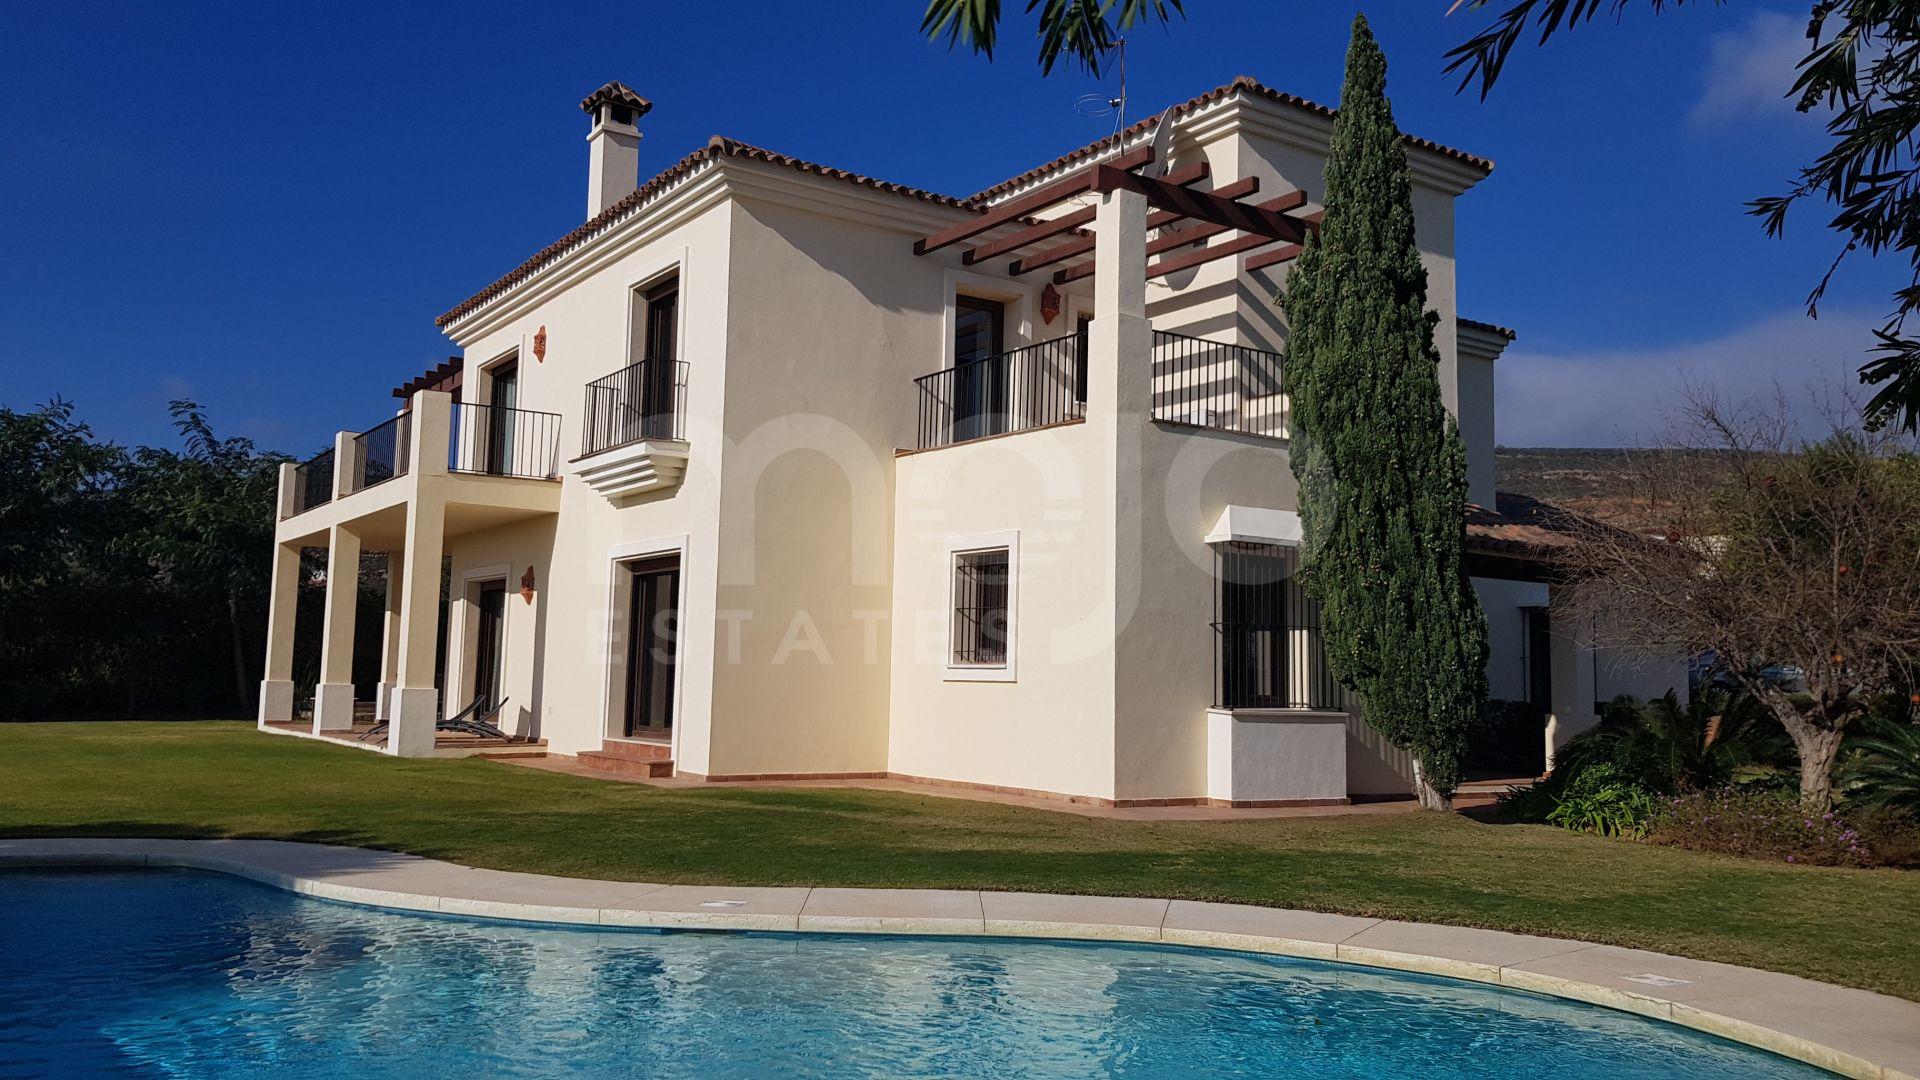 4 bedroom villa for sale in San Diego, 5 minutes away from Sotogrande , Cadiz